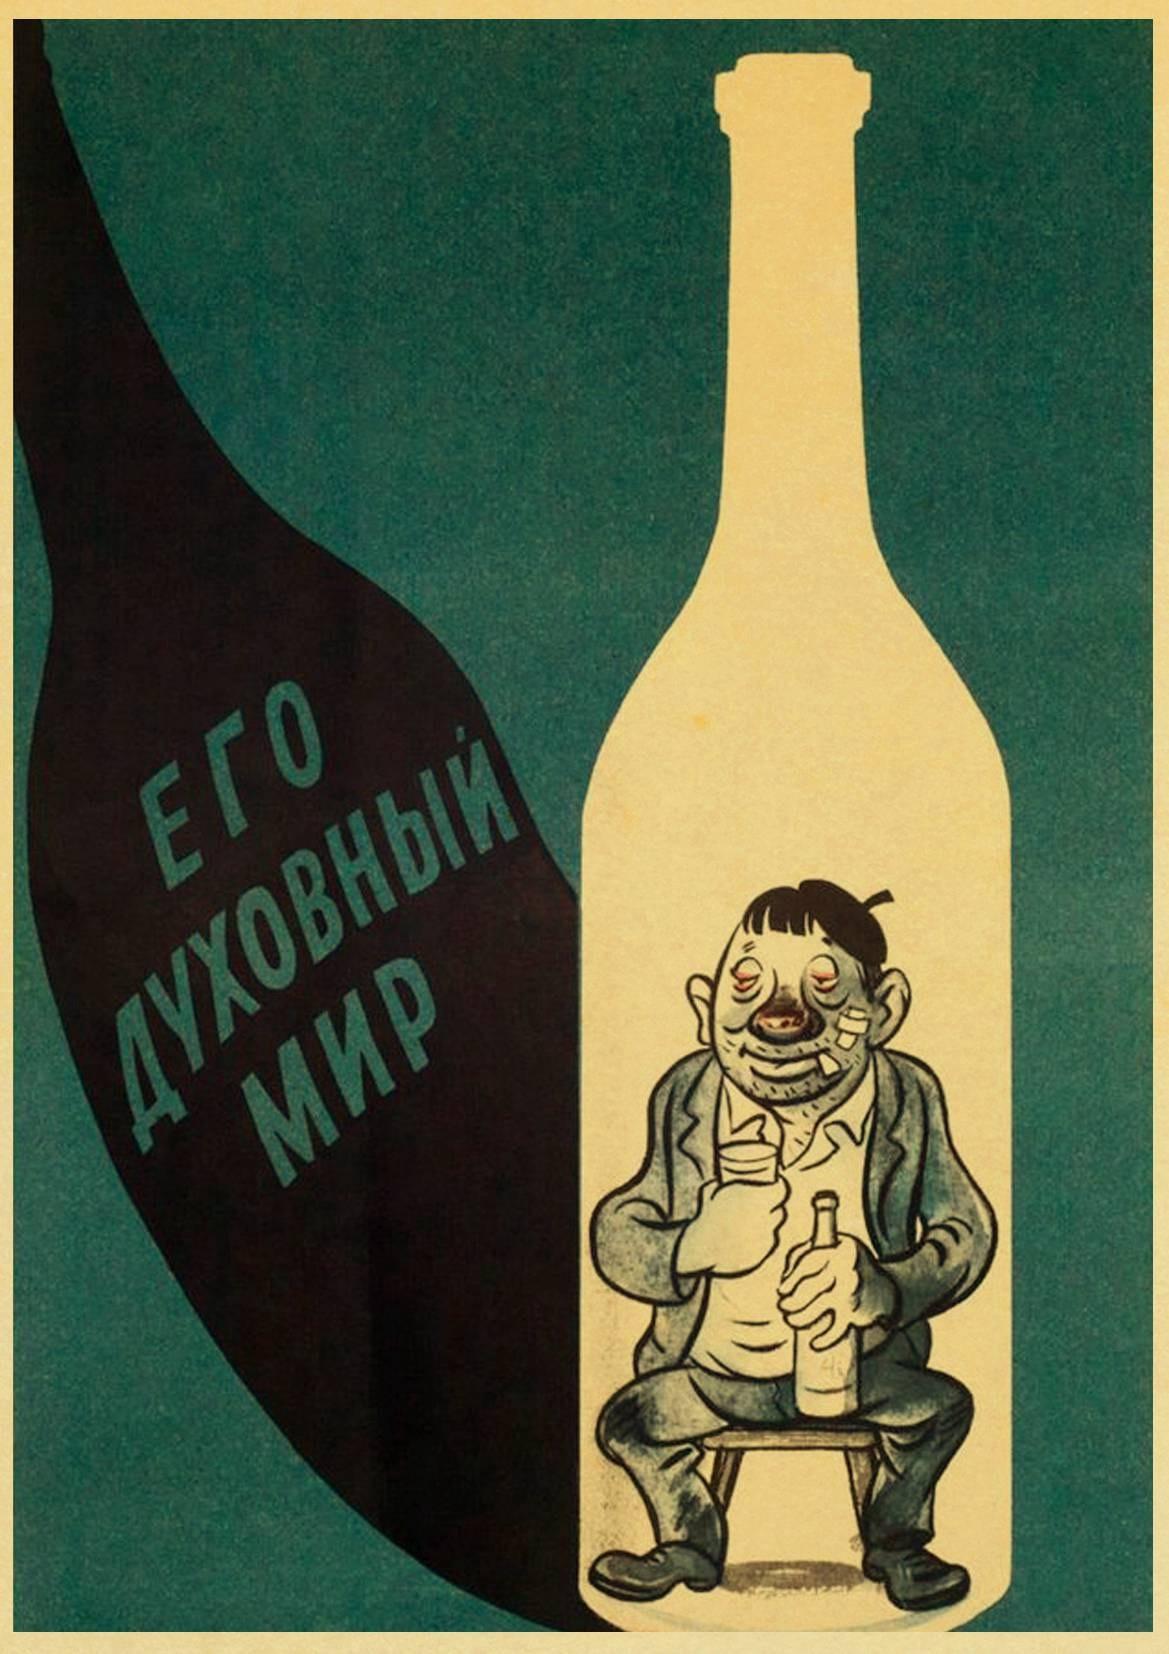 HTB1VbPnX2vsK1Rjy0Fiq6zwtXXaV Stalin USSR CCCP Retro Poster Good Quality Printed Wall Retro Posters For Home Bar Cafe Room Wall sticker